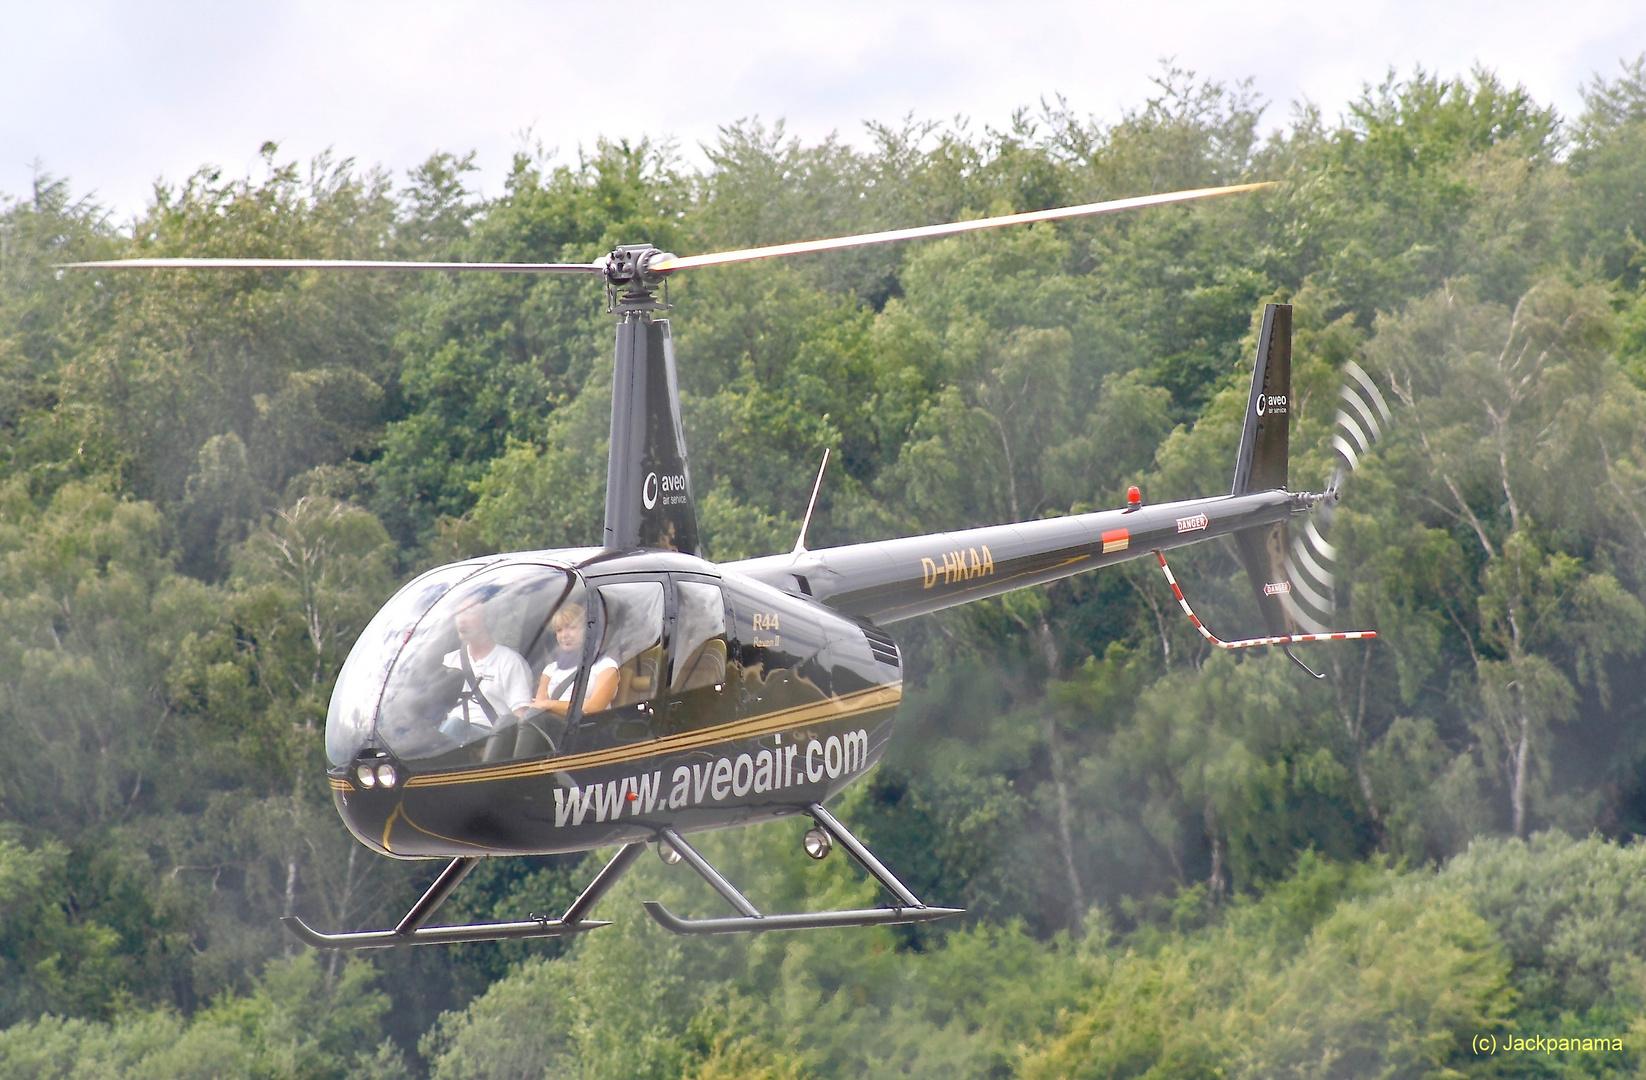 Rundflug am Flugplatz Schwarze Heide in Kirchhellen